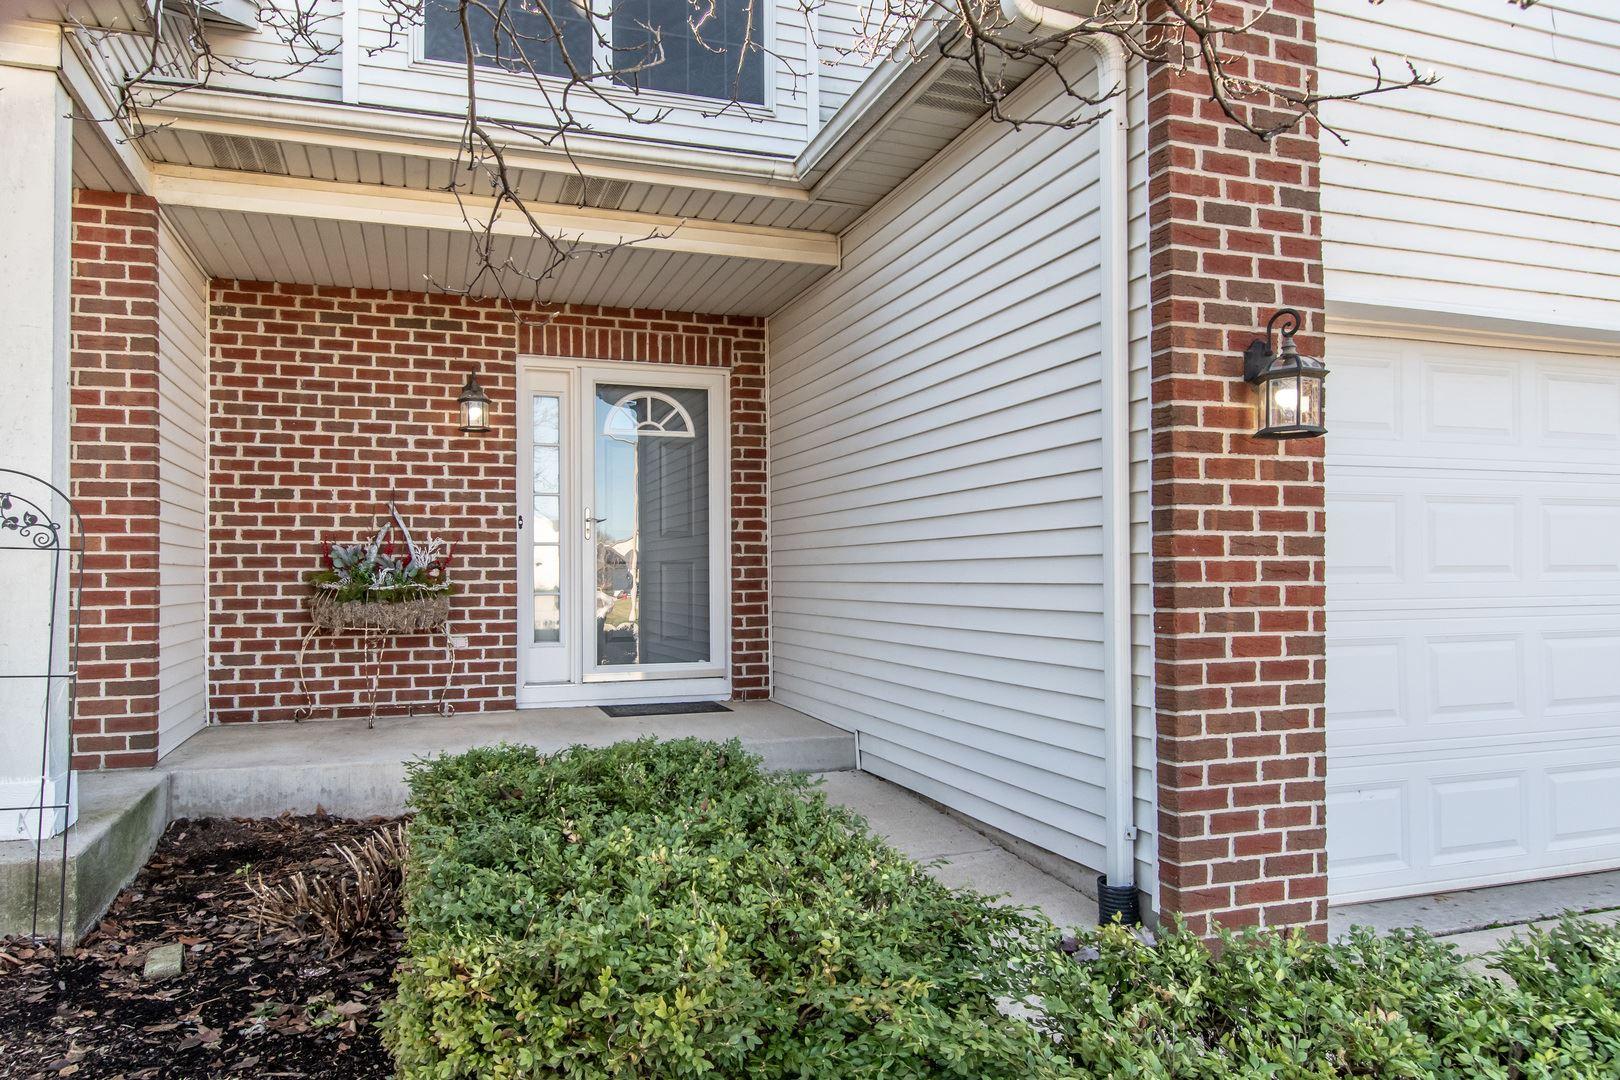 Photo of 1212 Glen Mor Drive #B, Shorewood, IL 60404 (MLS # 10943319)